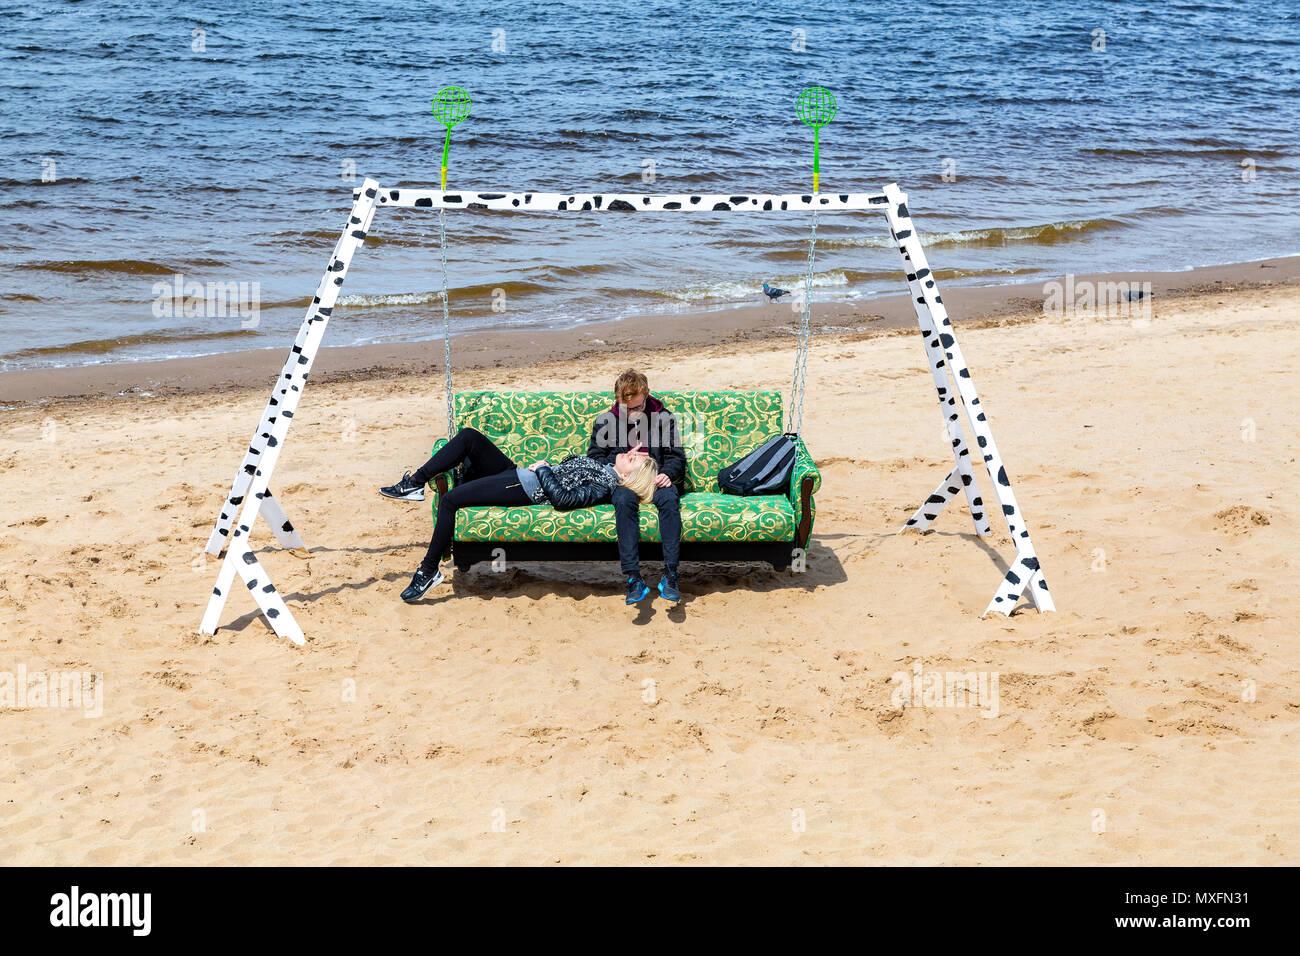 Samara, Russia - June 2, 2018: Art installation as the swing at the sand beach of Volga river. Interregional festival of city embankments 'Volga Fest  - Stock Image